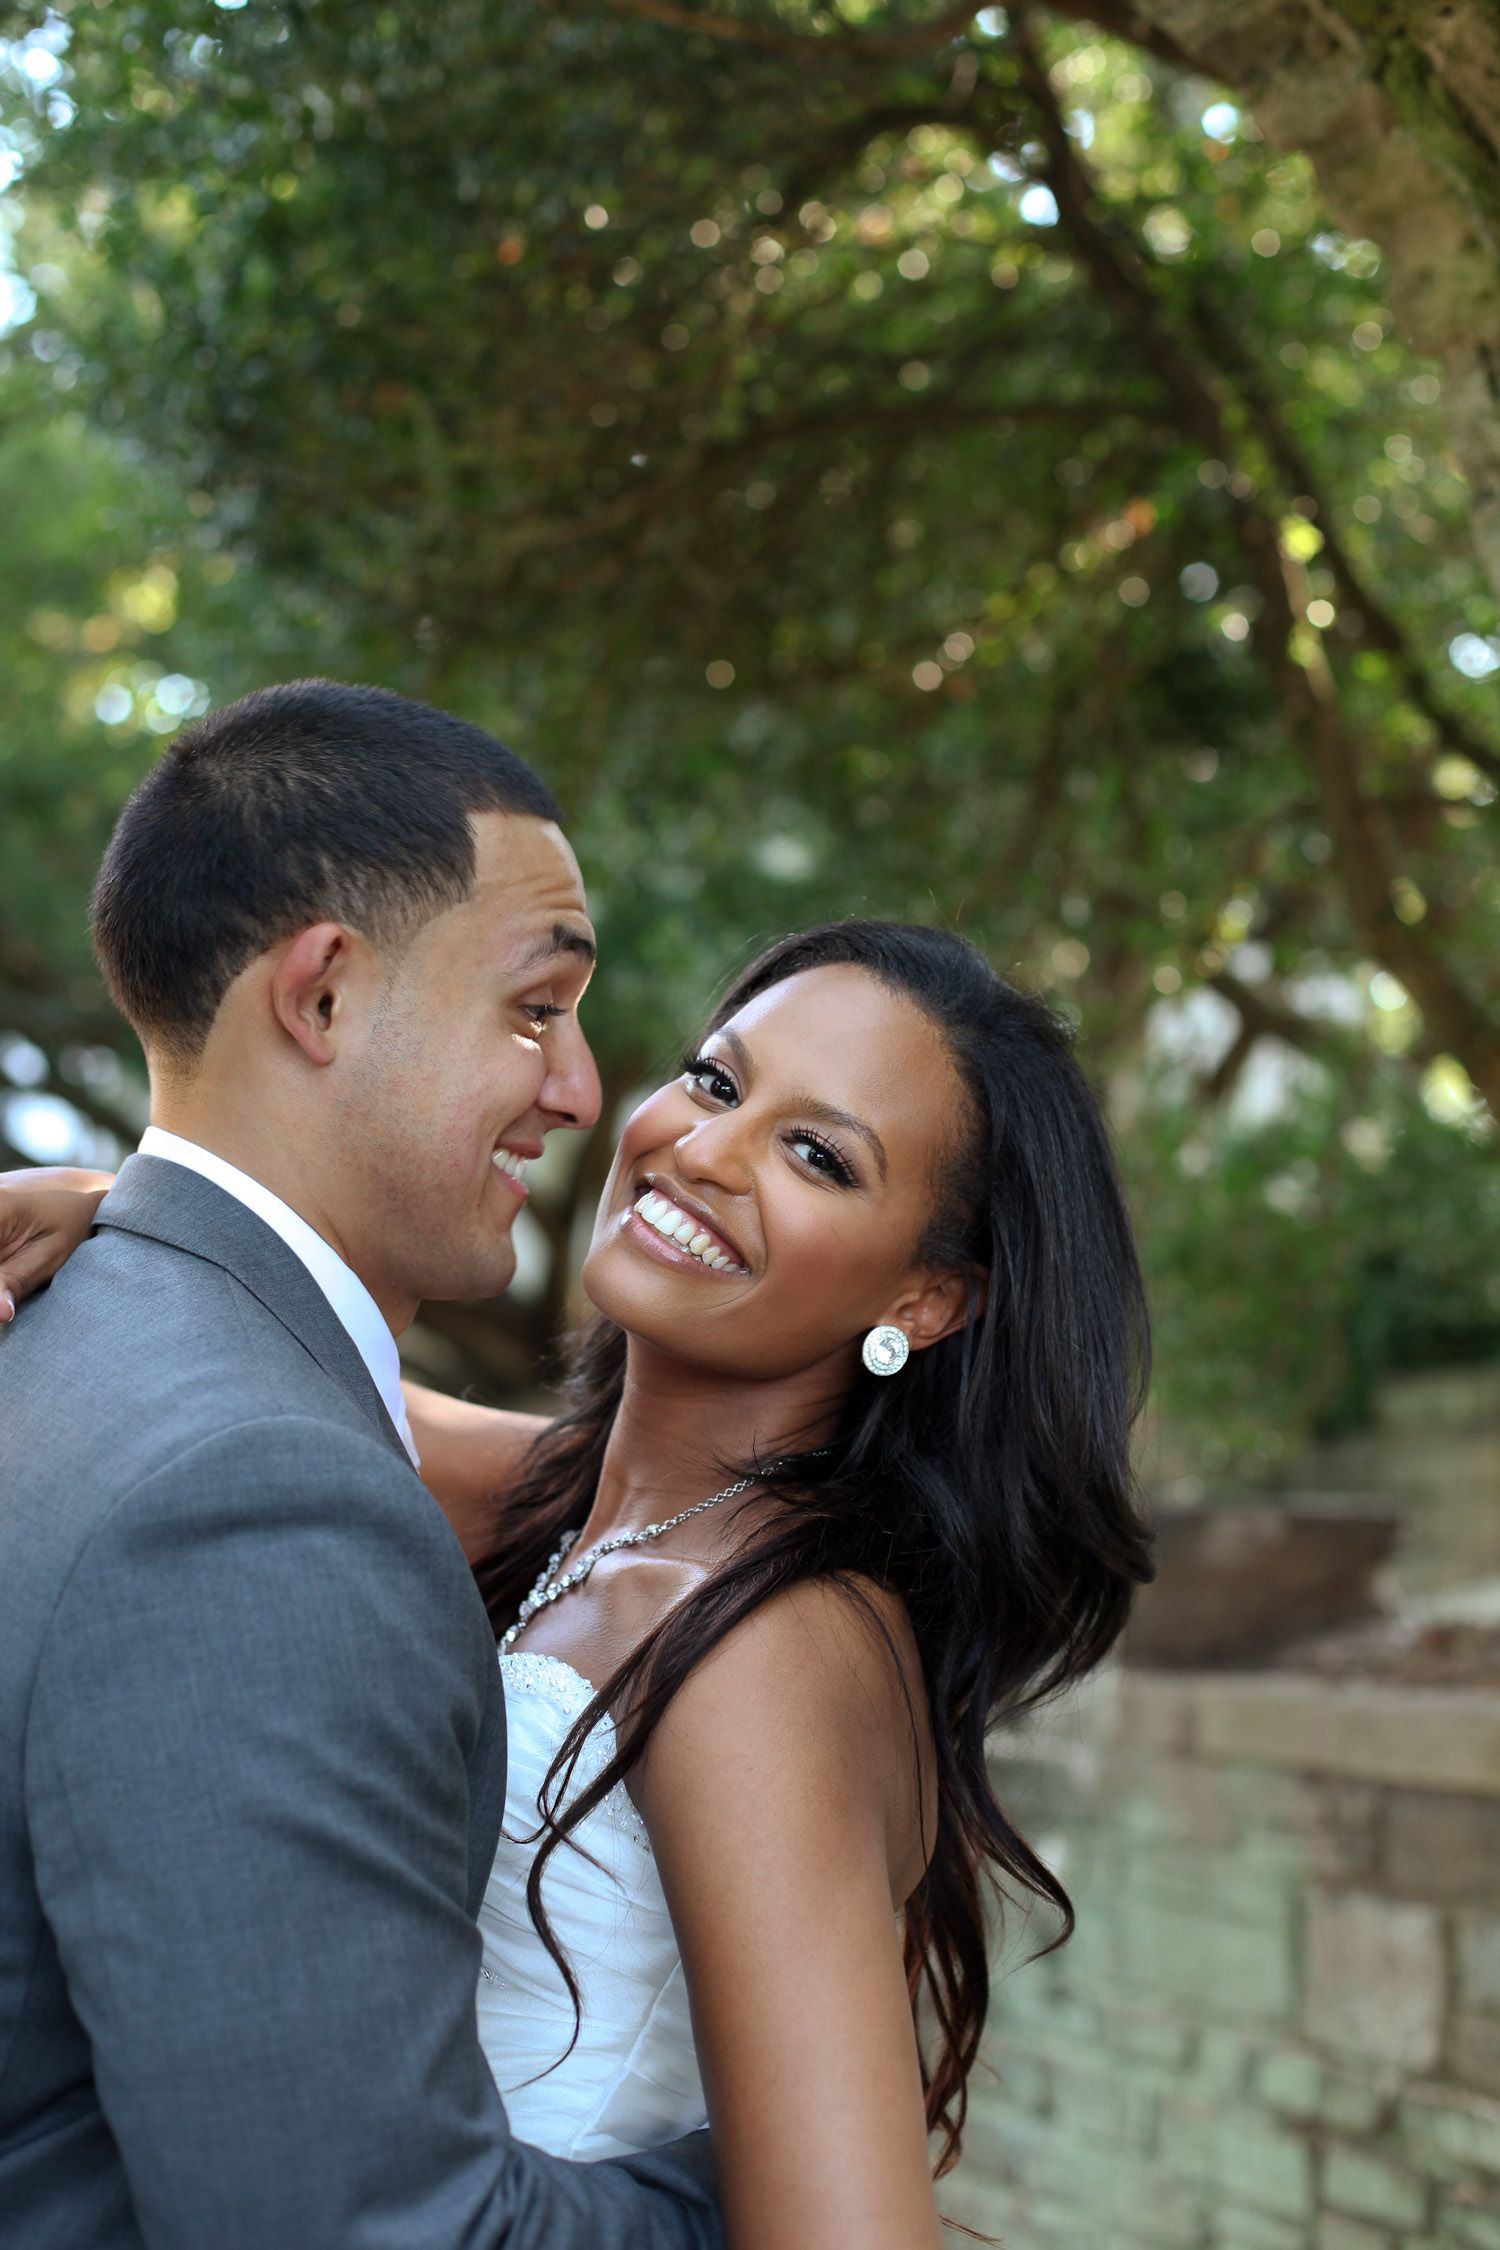 Ethio love dating